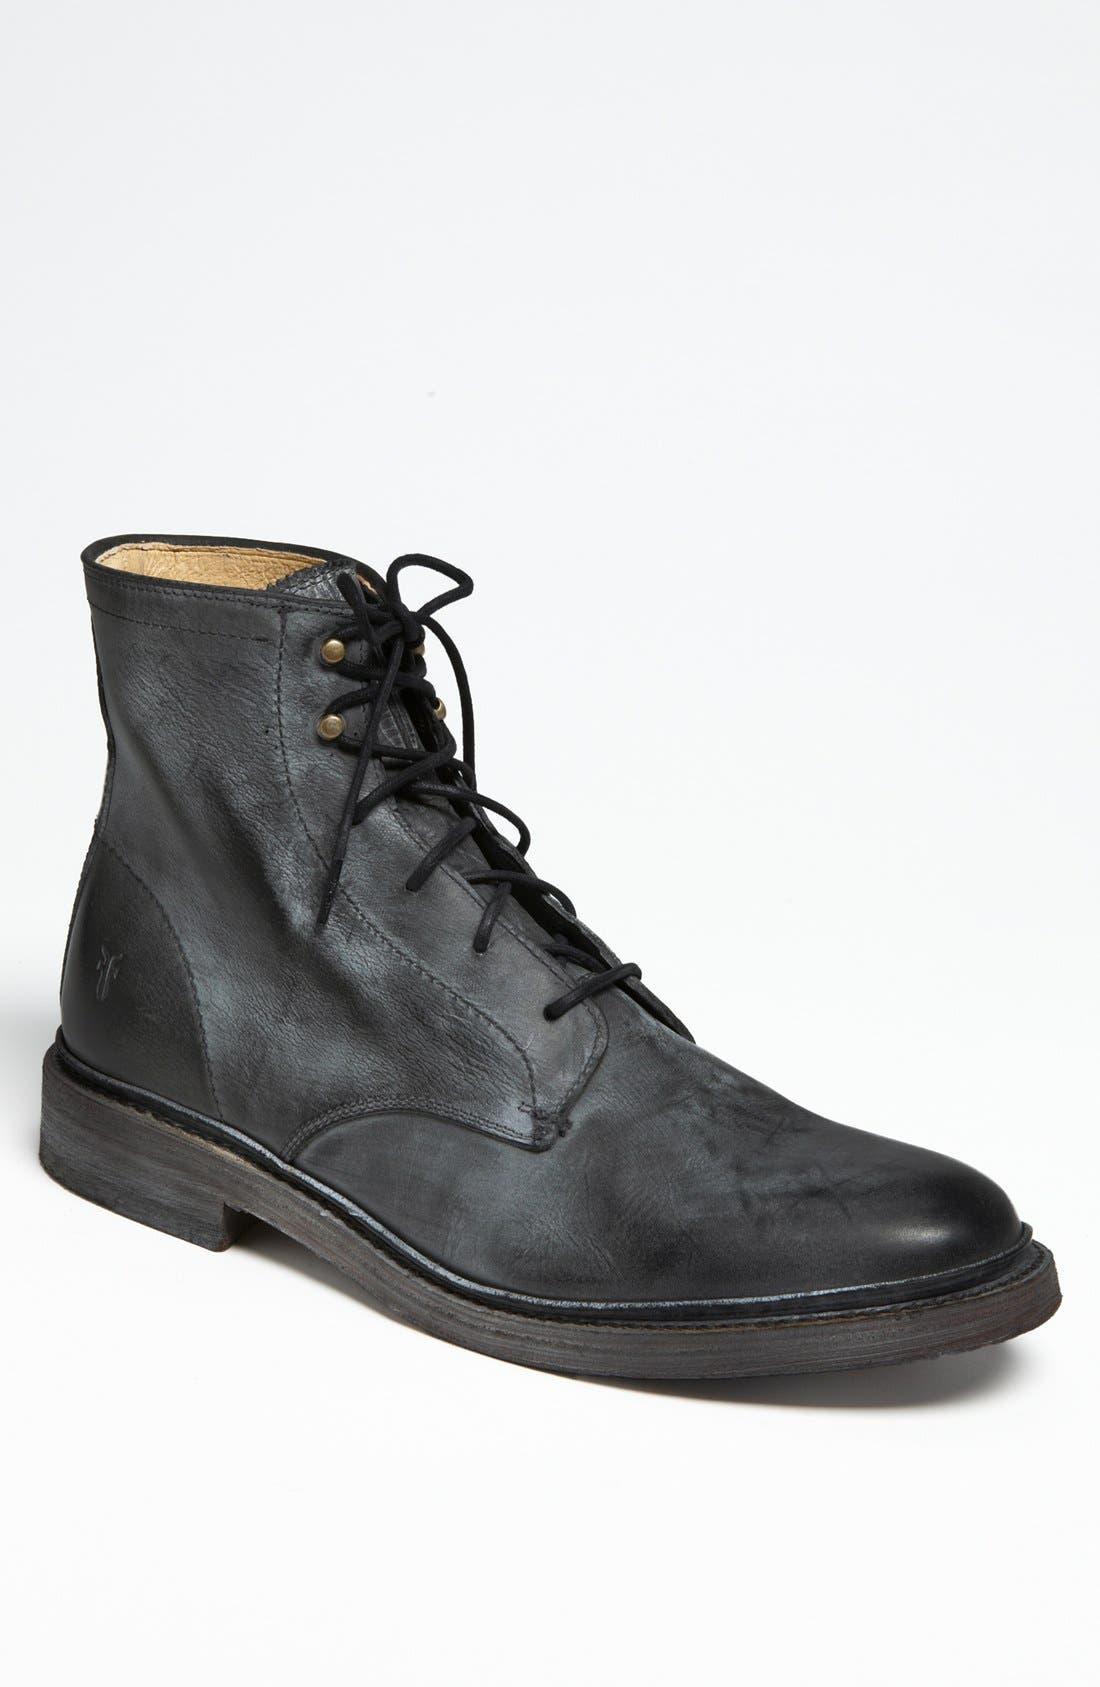 Alternate Image 1 Selected - Frye 'James' Boot (Men)